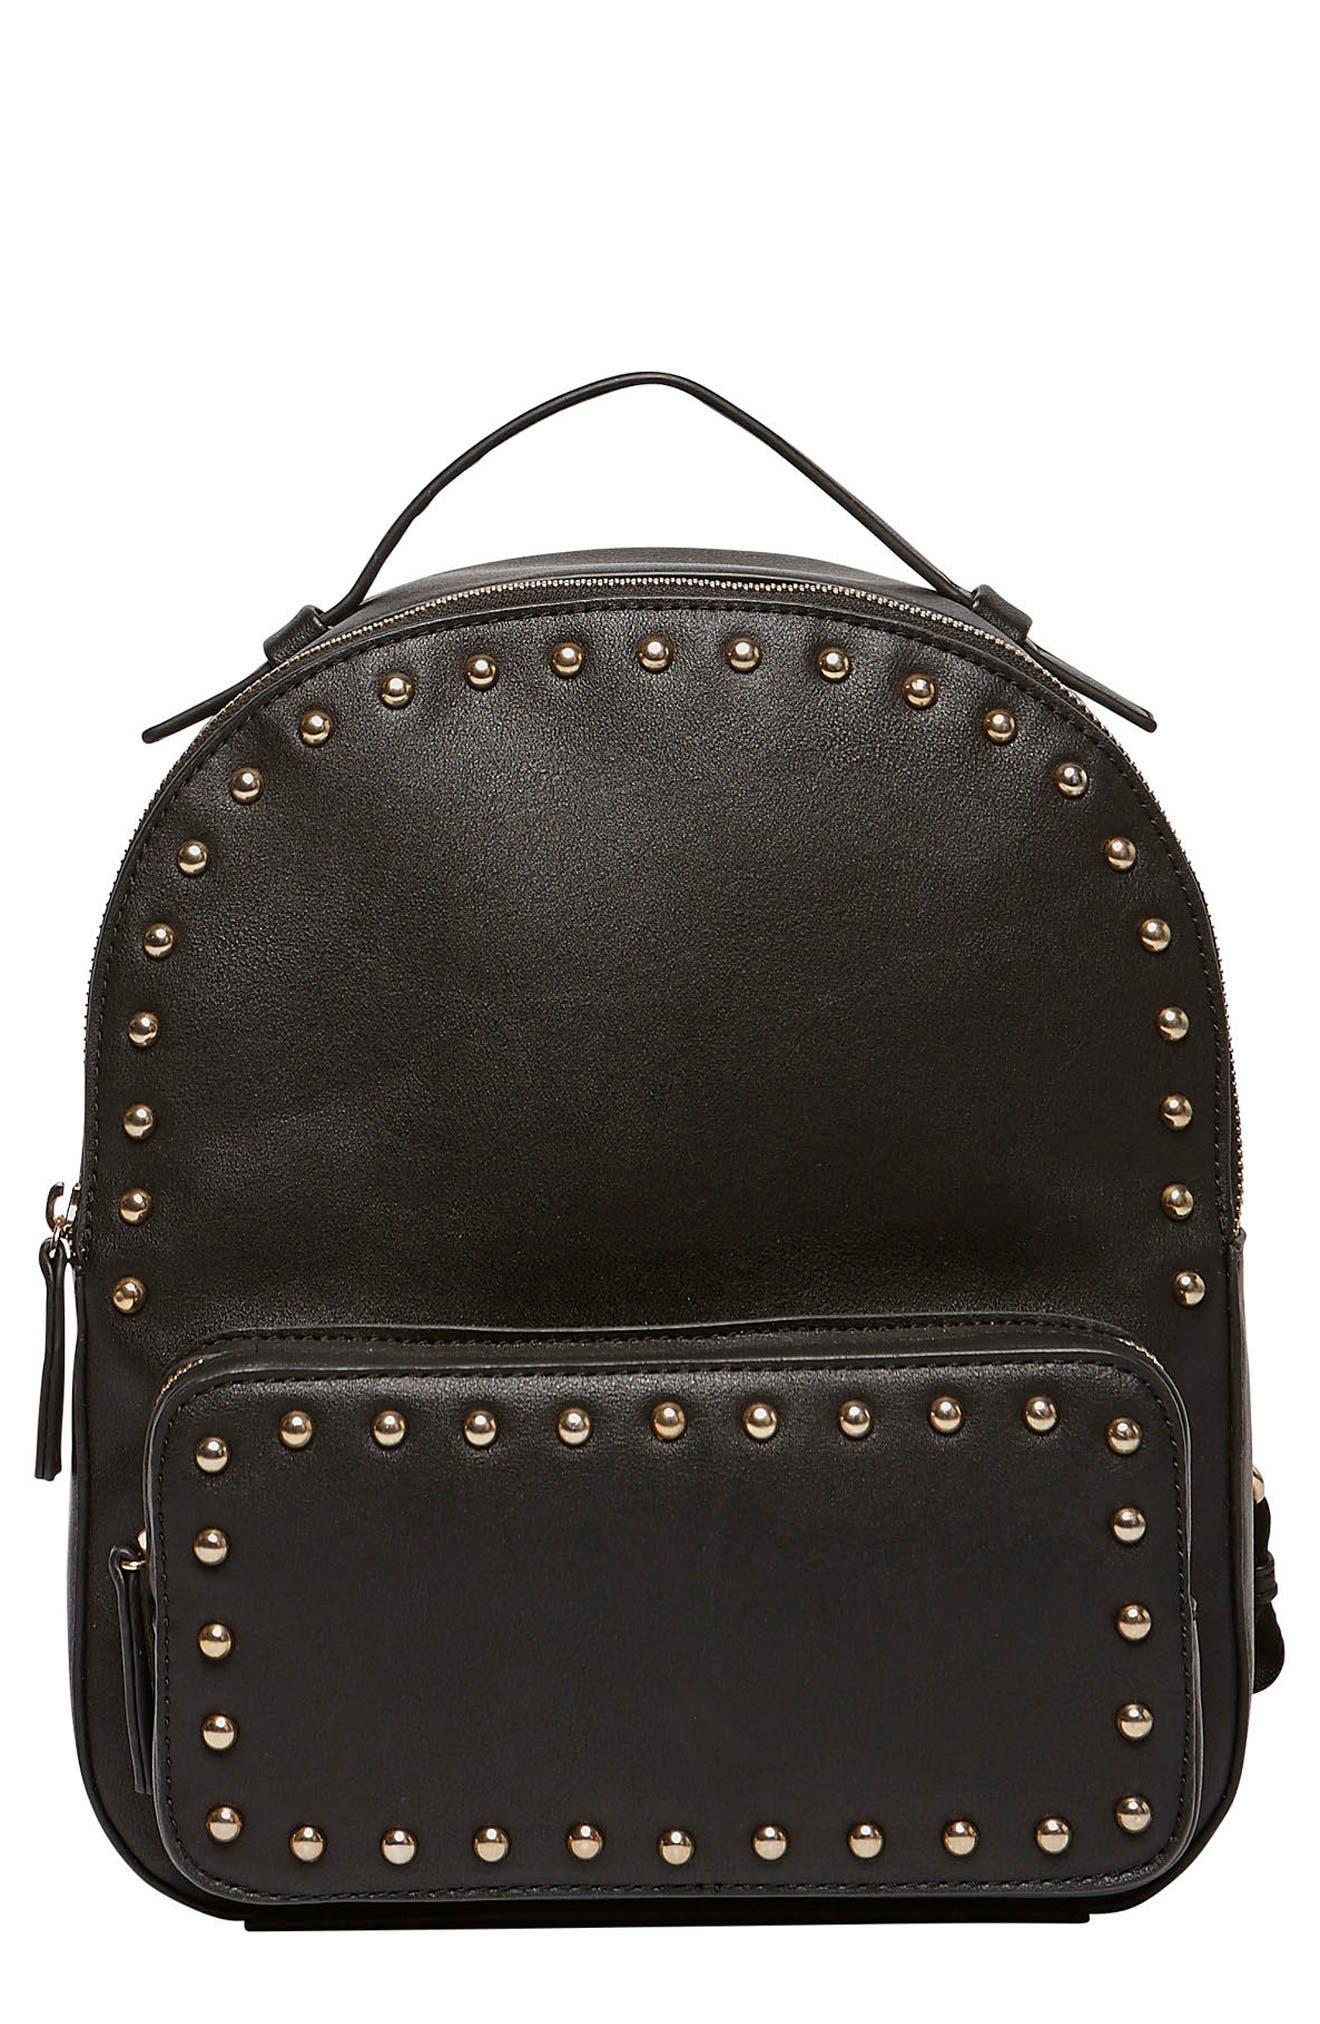 Star Seeker Vegan Leather Backpack,                             Main thumbnail 1, color,                             Black